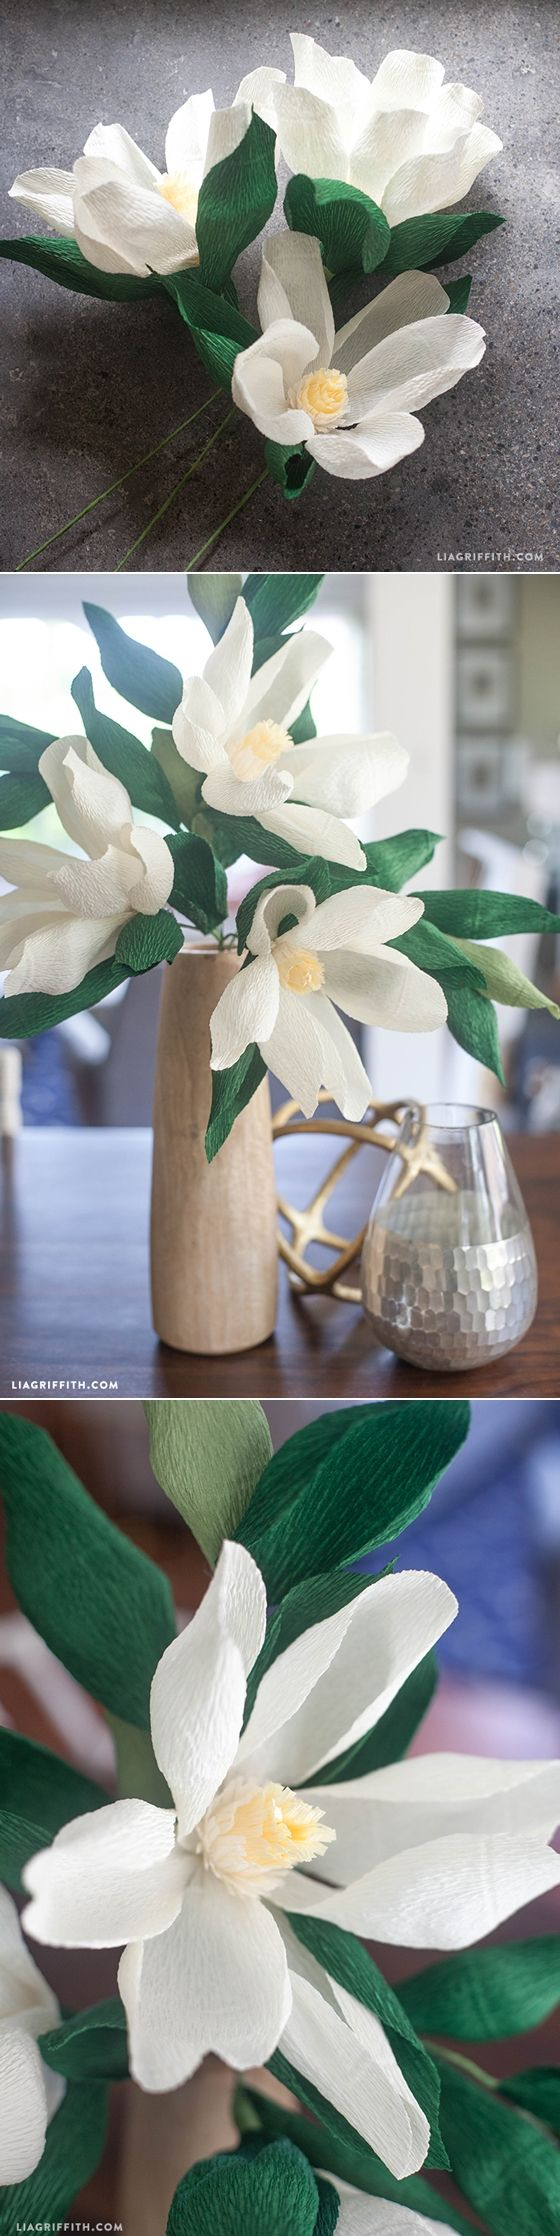 #paperflower #DIY #crepepaperflower #magnolia at www.LiaGriffith.com